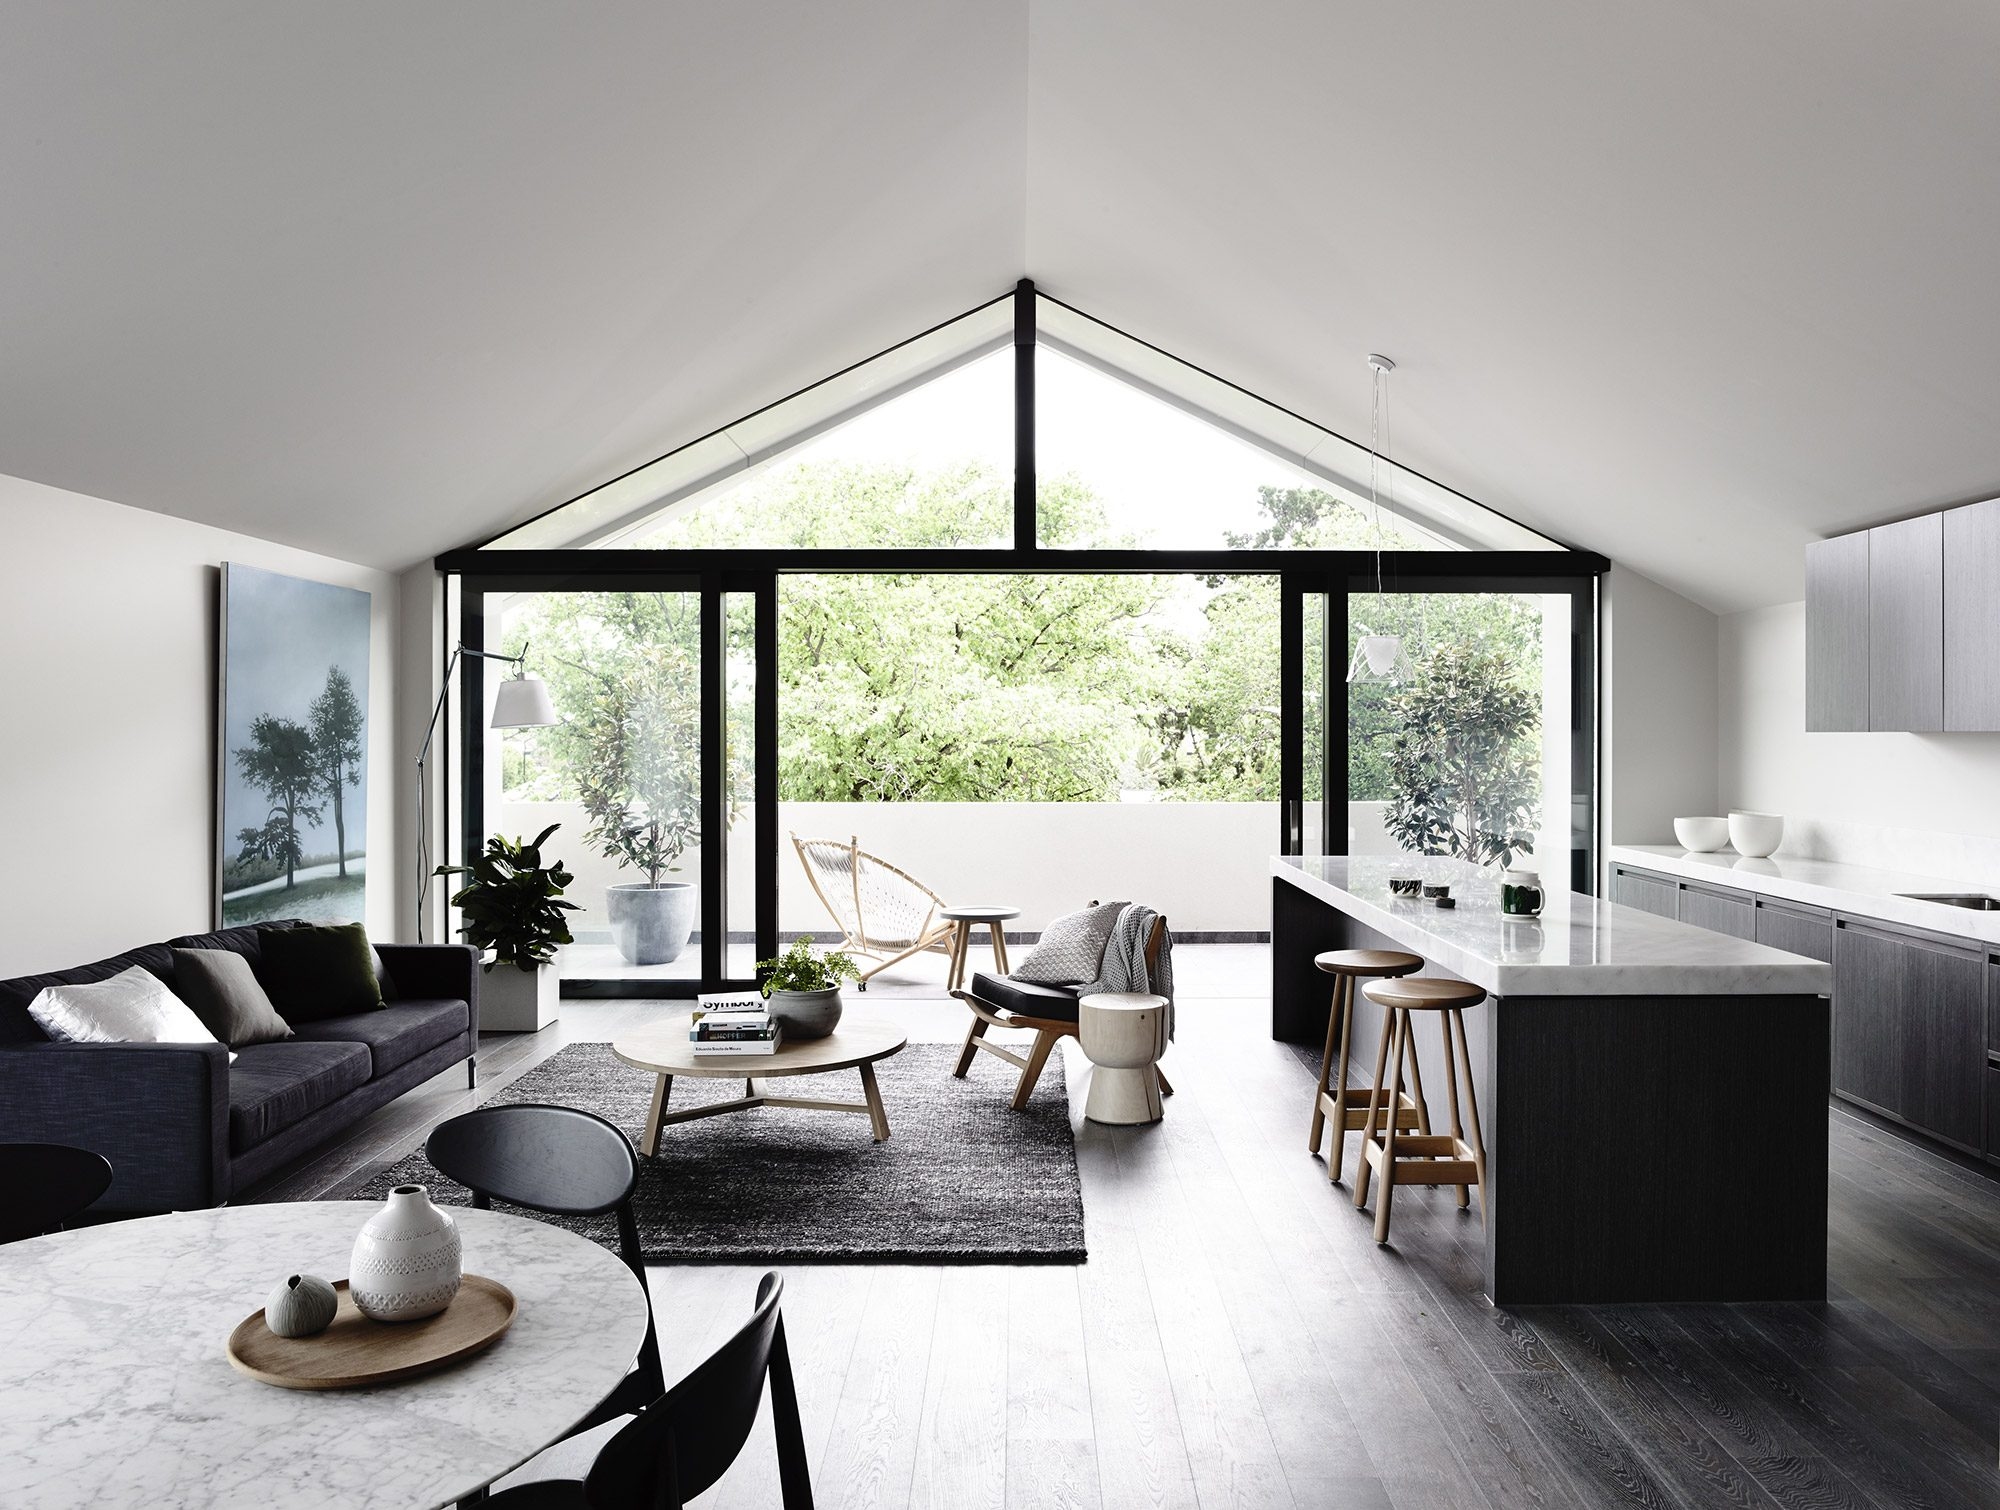 Apartment Architects Interior Designers Bayside 55 New St Brighton Rob Mills Architects